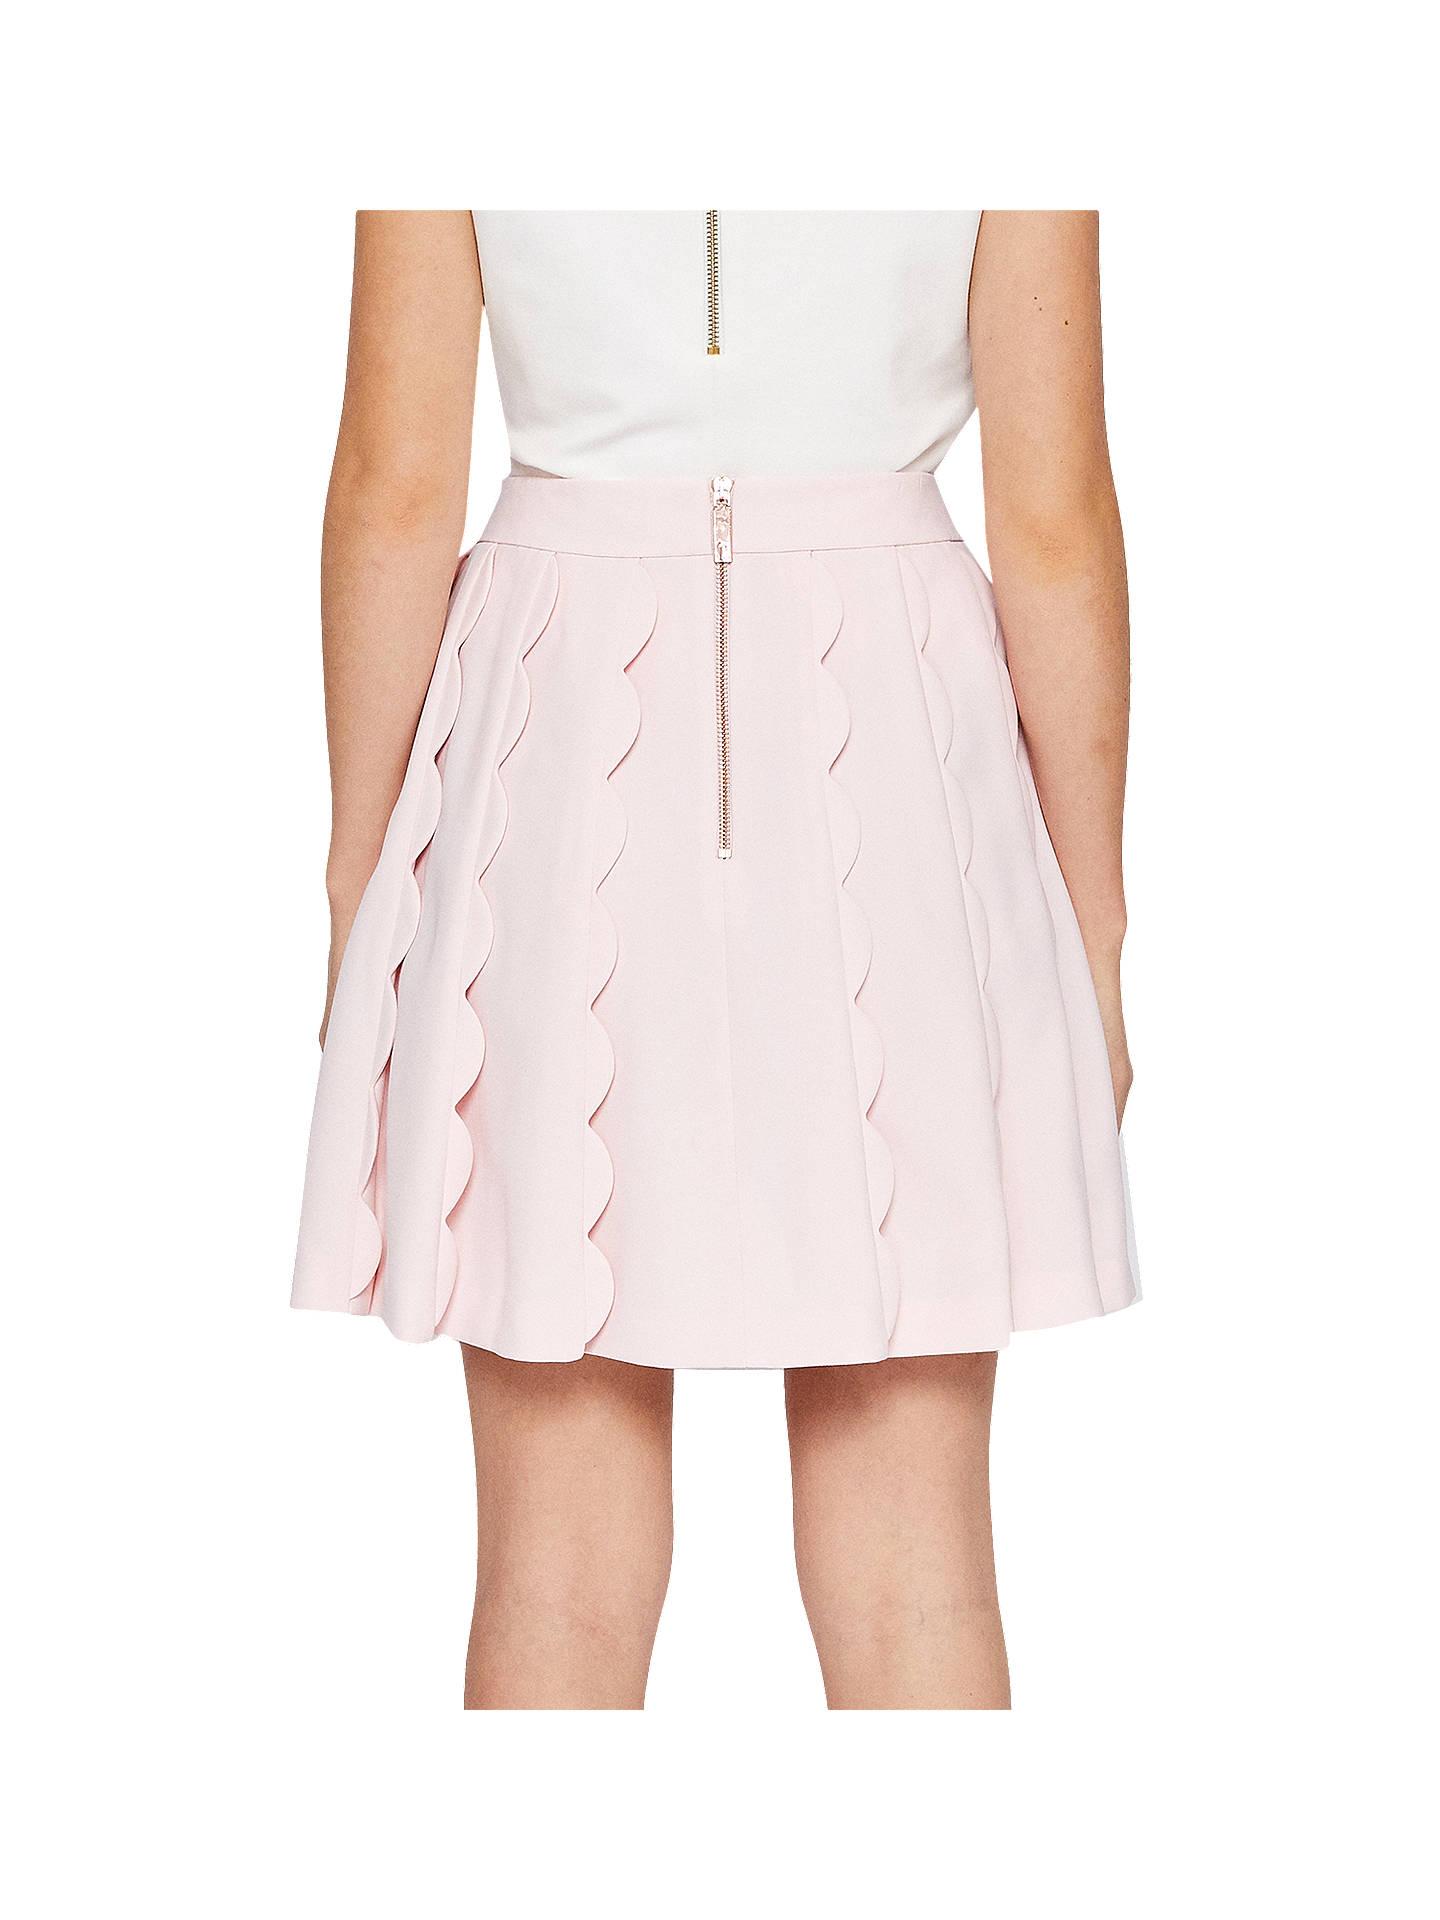 121e69b845 ... Buy Ted Baker Poppay Scallop Detail Mini Skirt, Baby Pink, 0 Online at  johnlewis ...